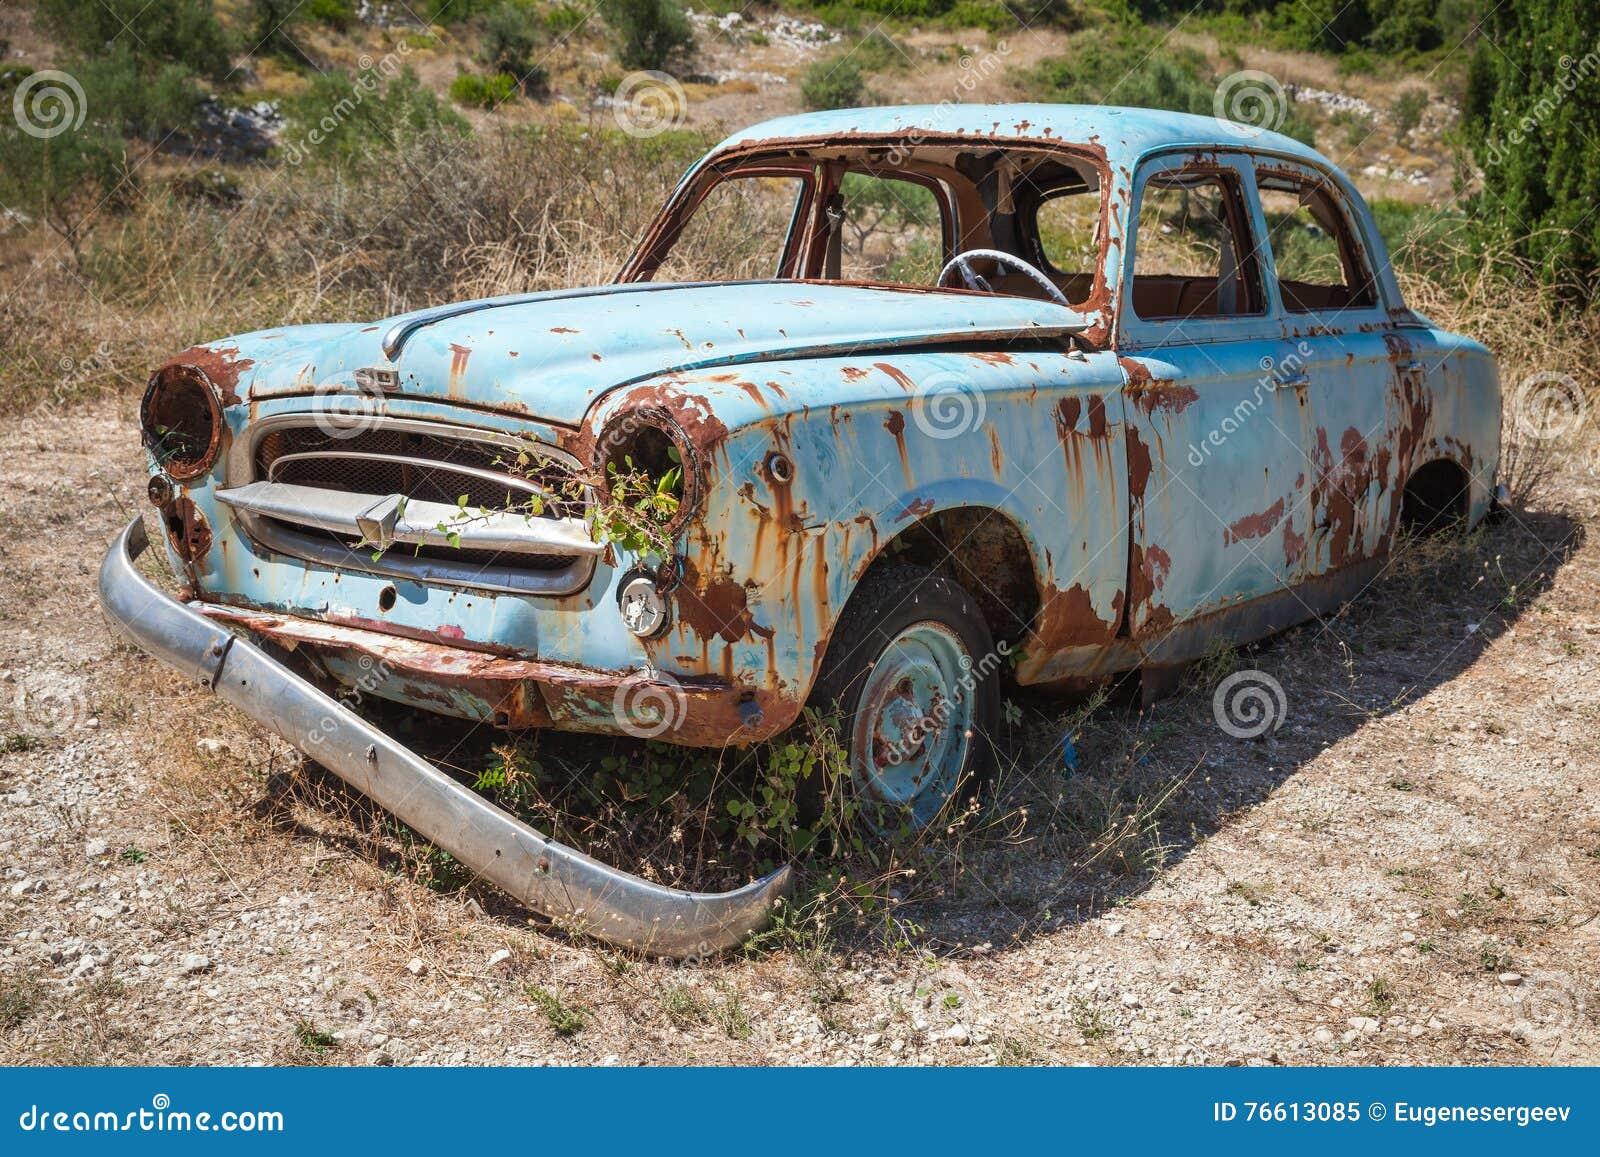 vieille voiture rouill e abandonn e image ditorial image 76613085. Black Bedroom Furniture Sets. Home Design Ideas